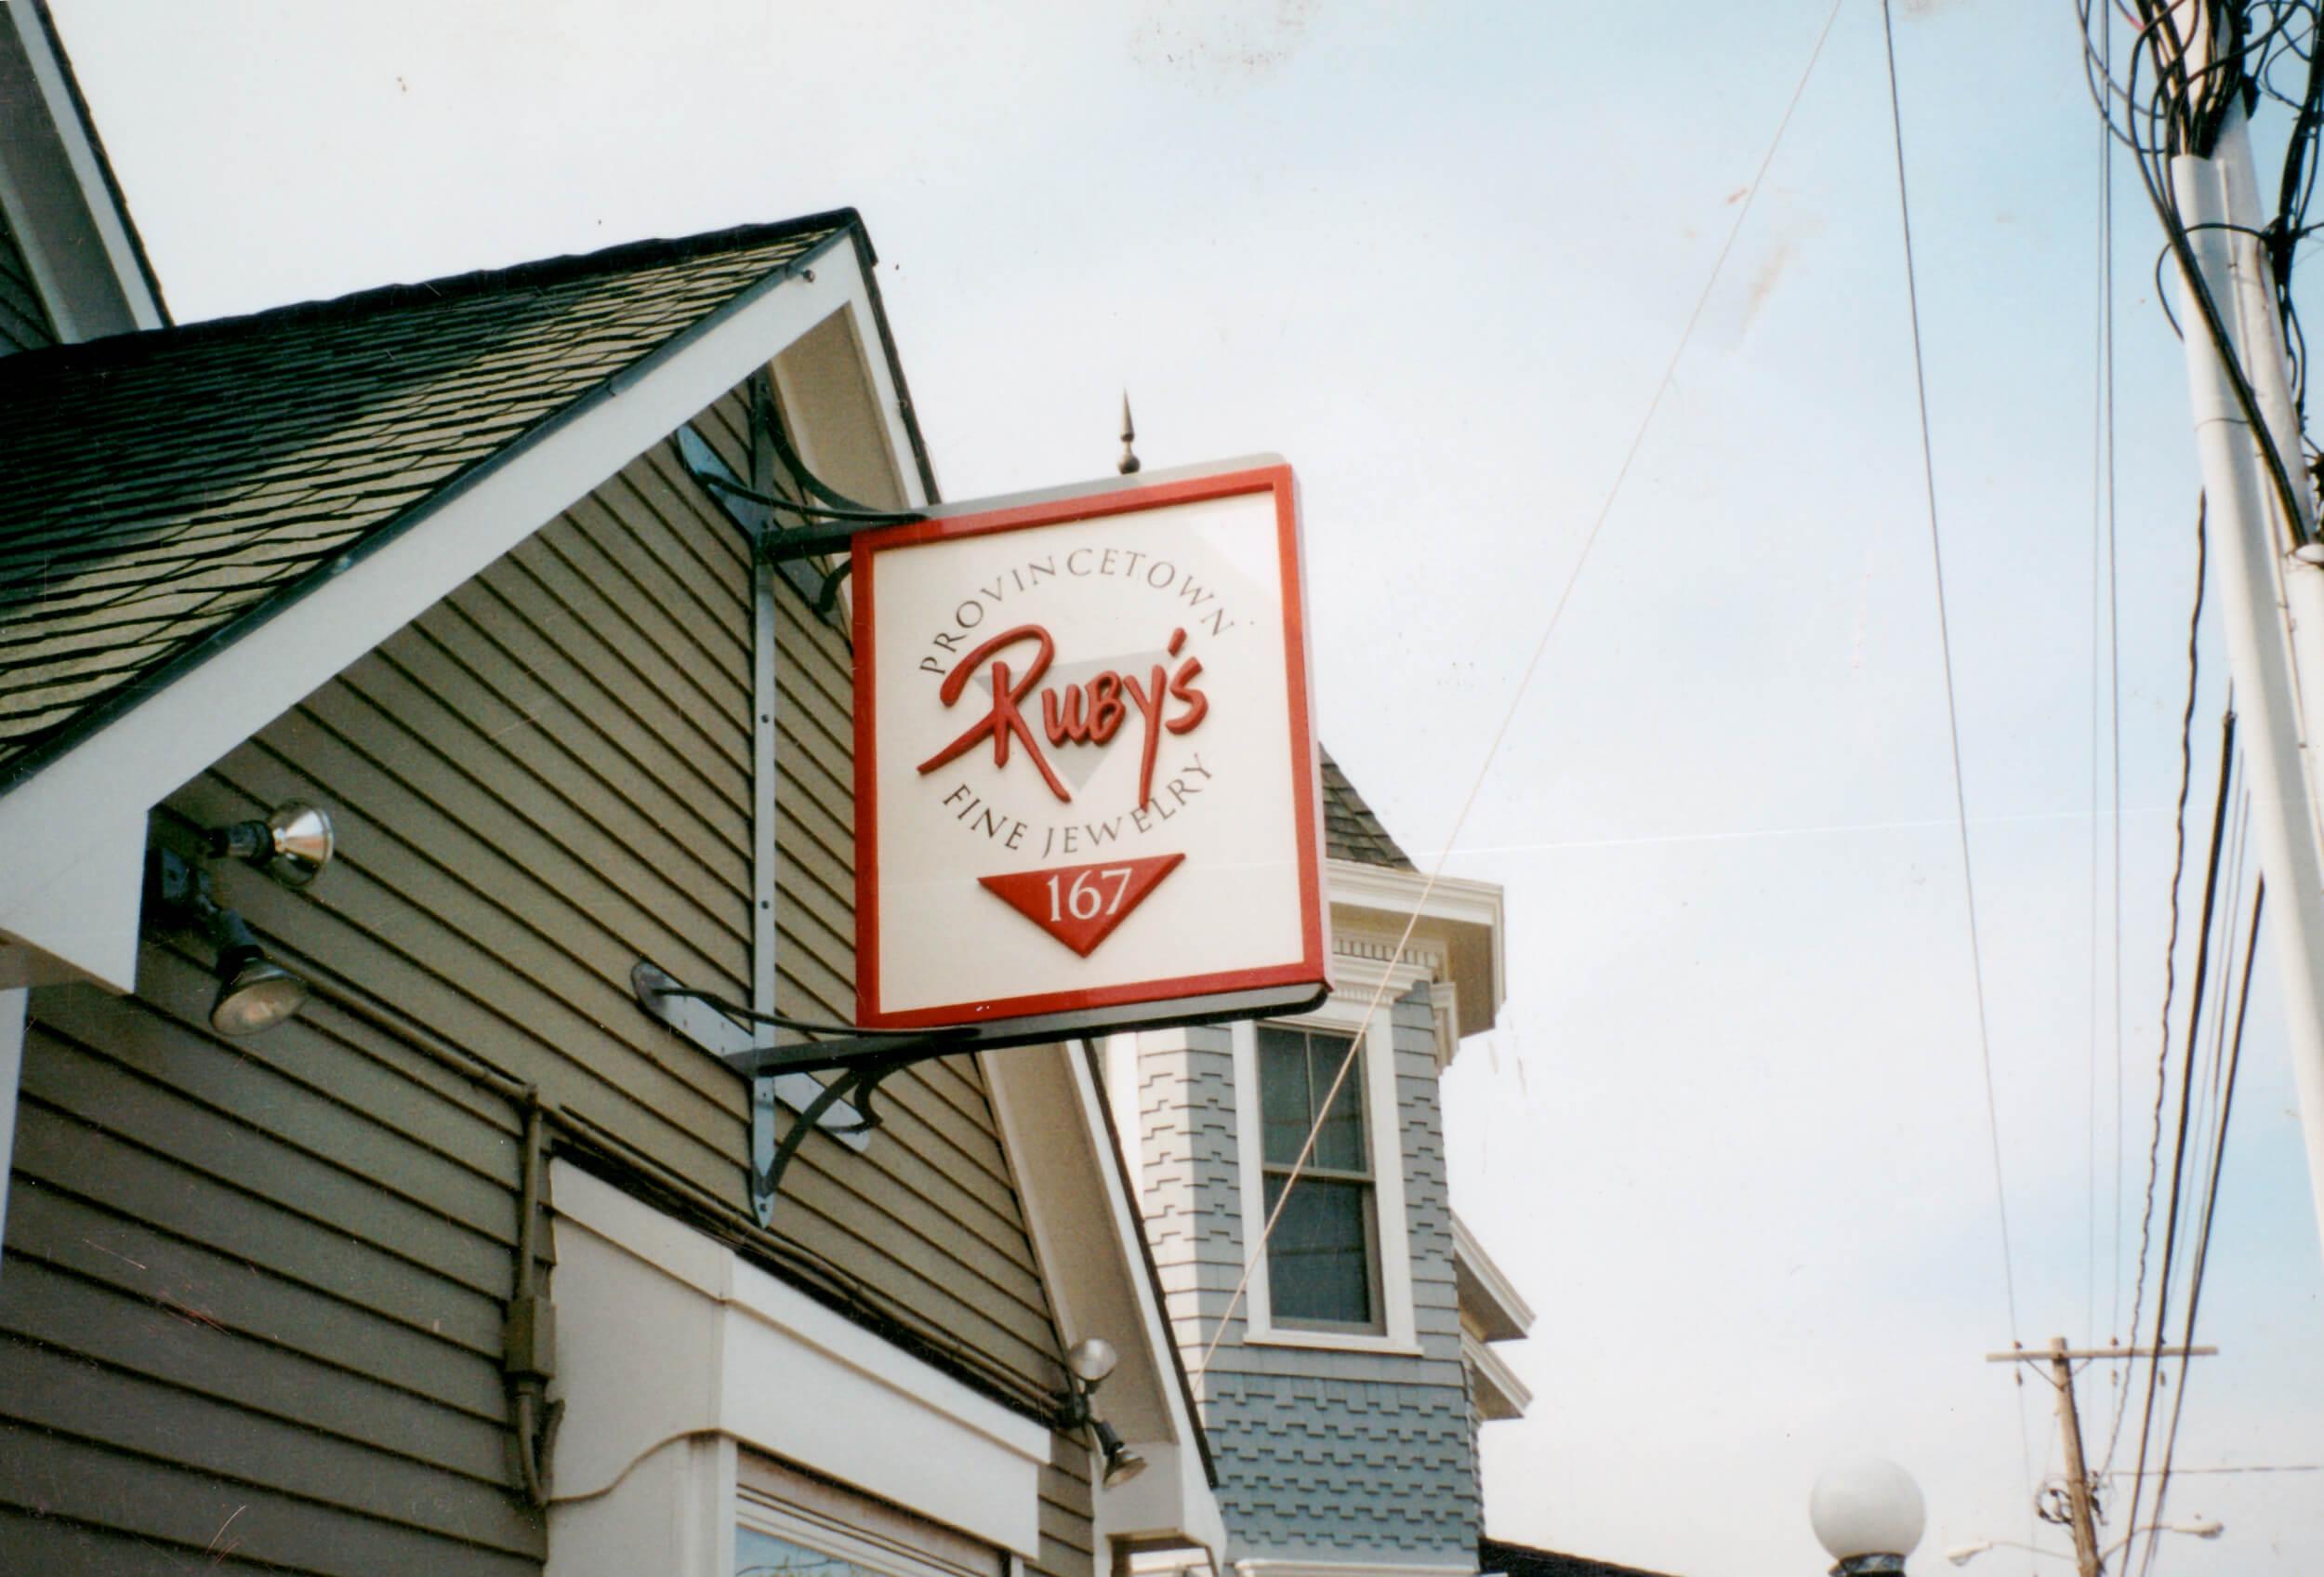 sign post Rubys.jpg